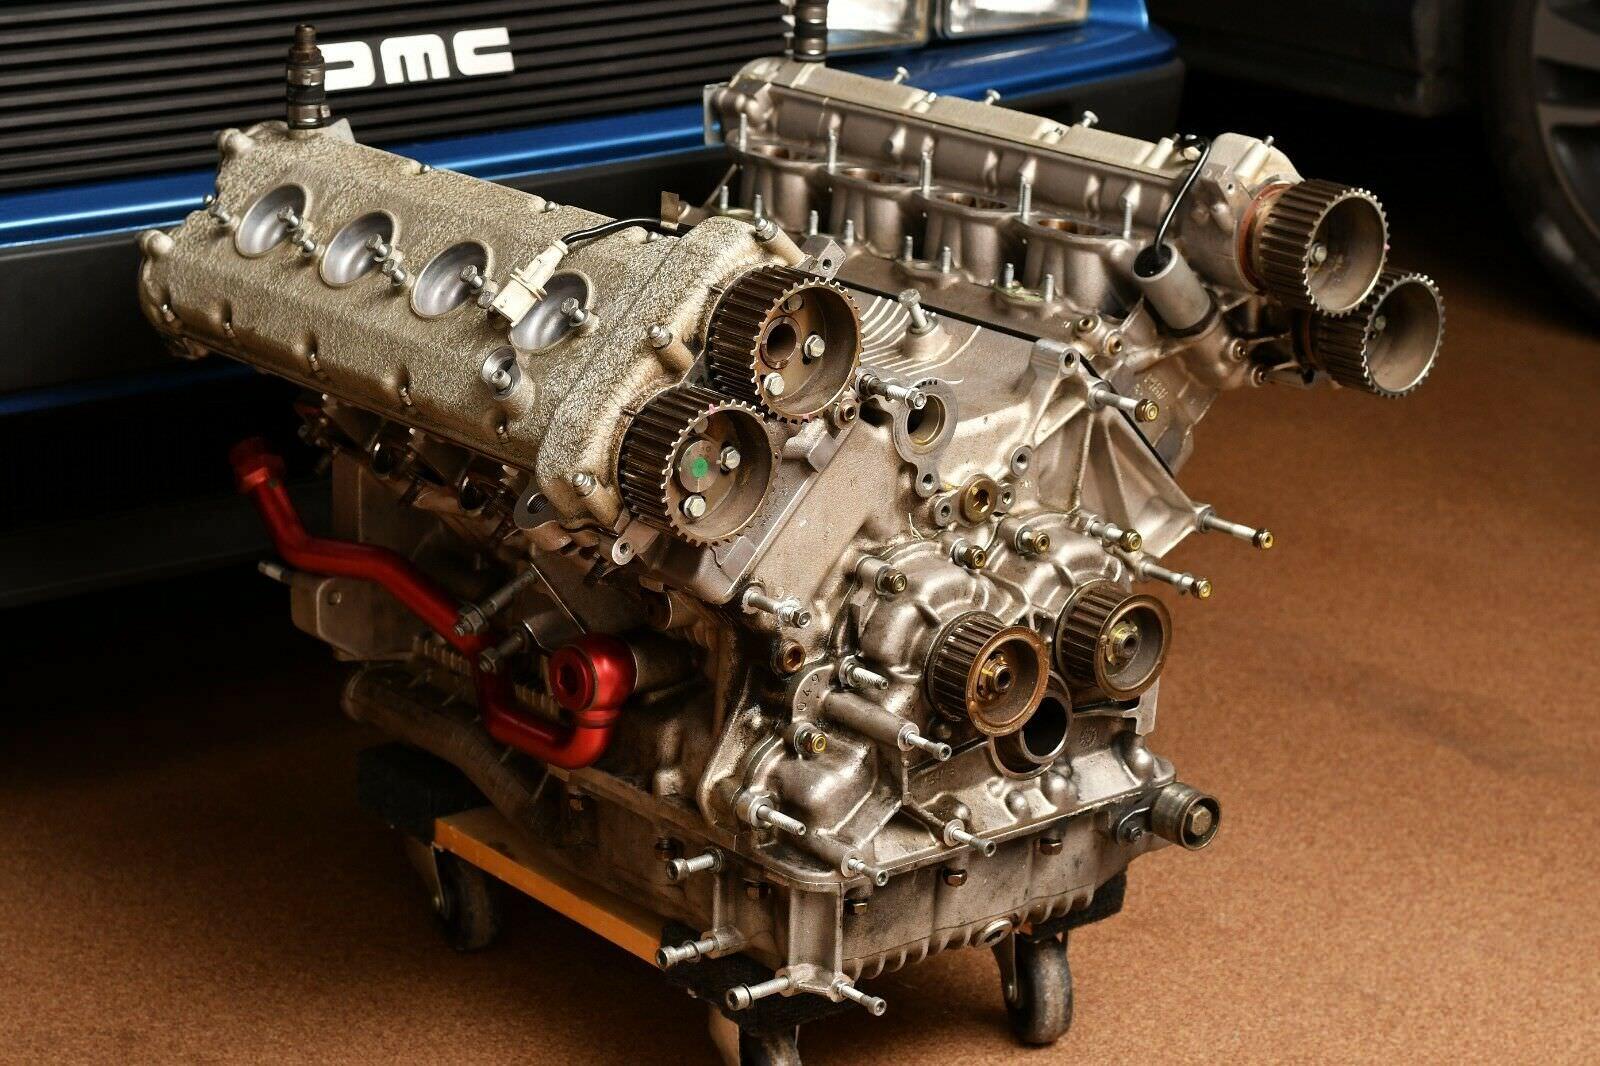 For Sale A Blown Ferrari 360 Challenge Stradale V8 Engine 4 999 Usd